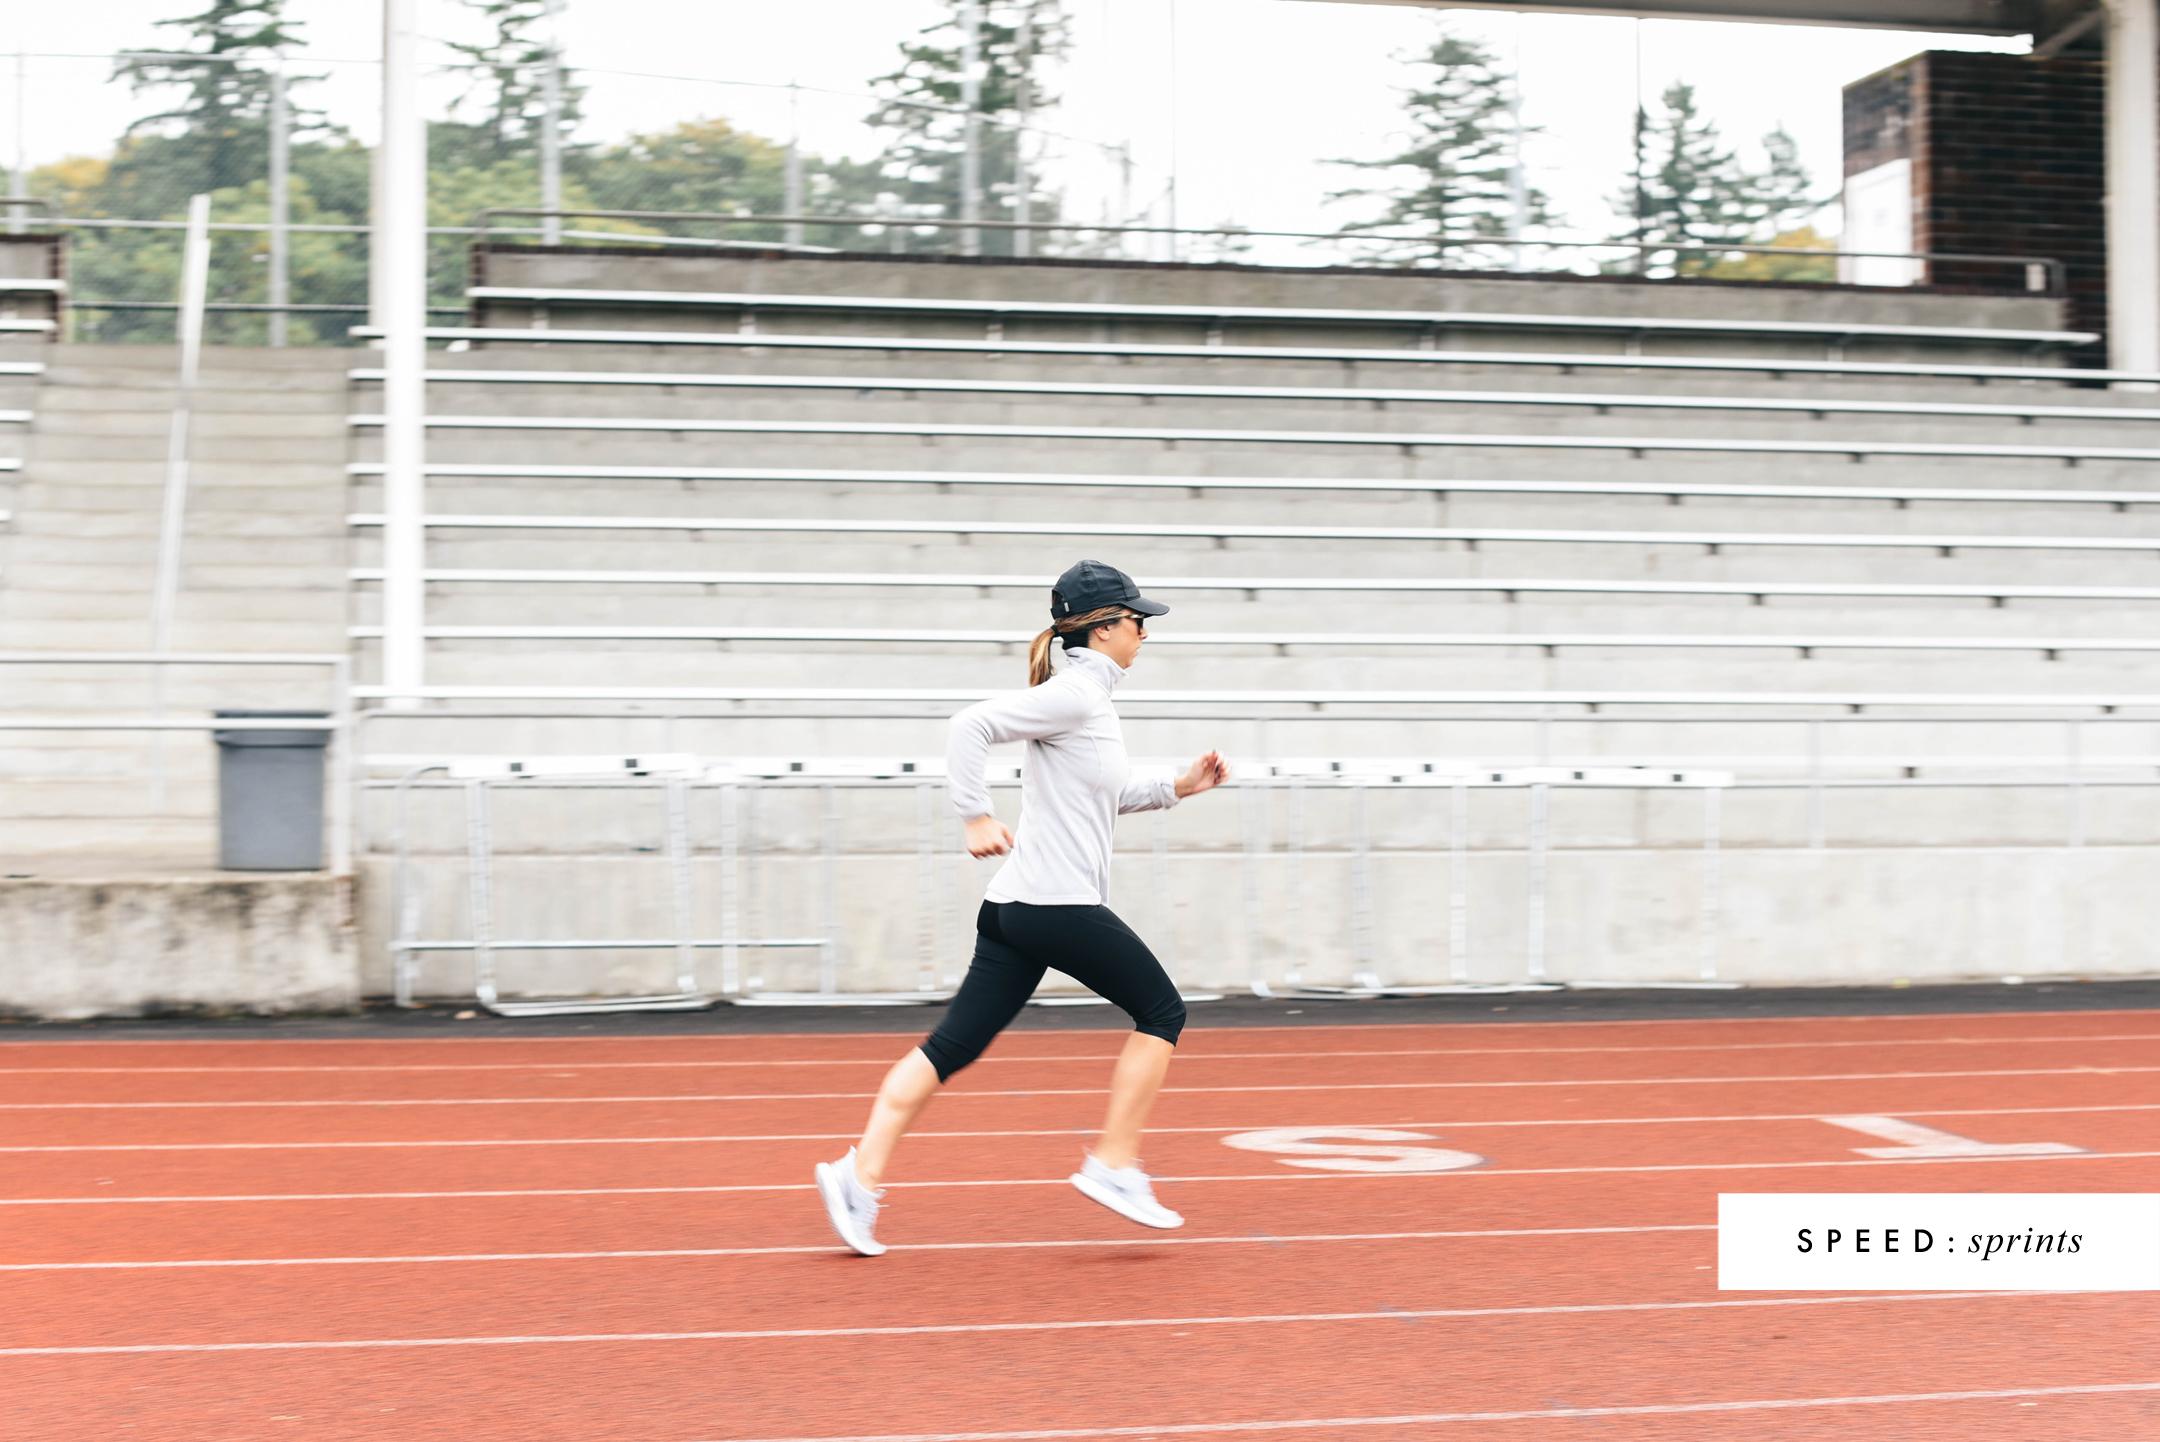 speed-sprints